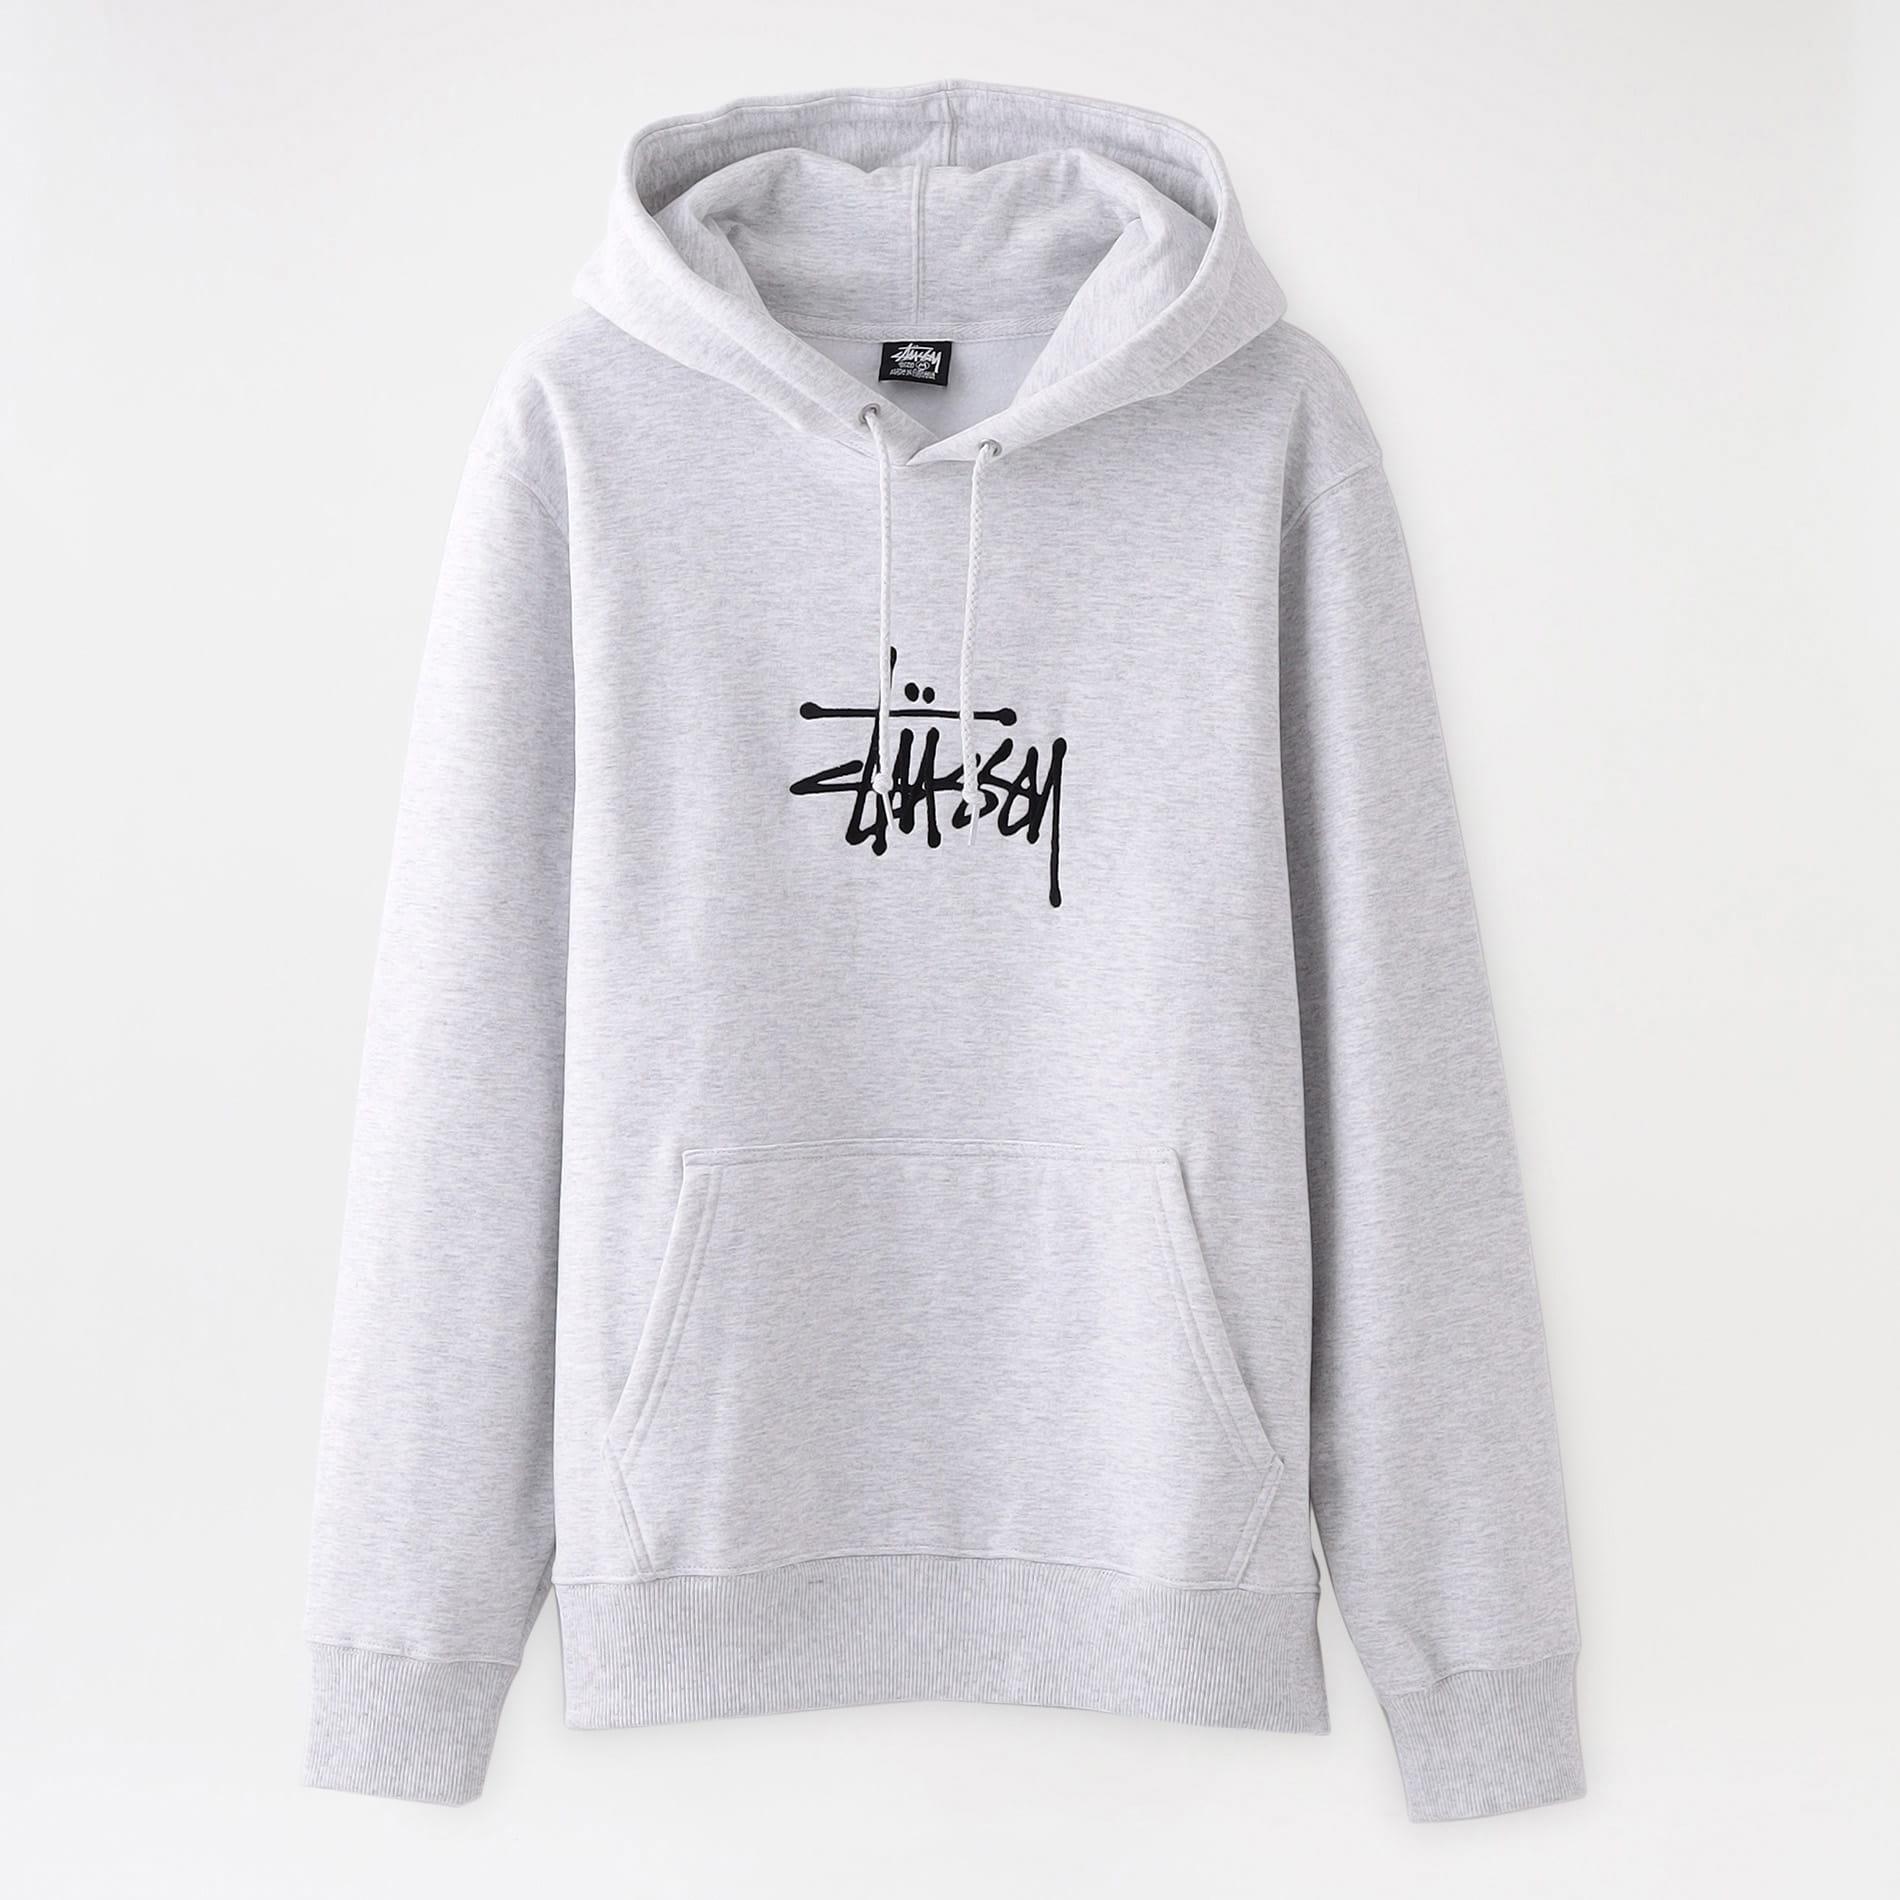 【Stussy】MEN パーカー Basic Stussy App Hood 118425